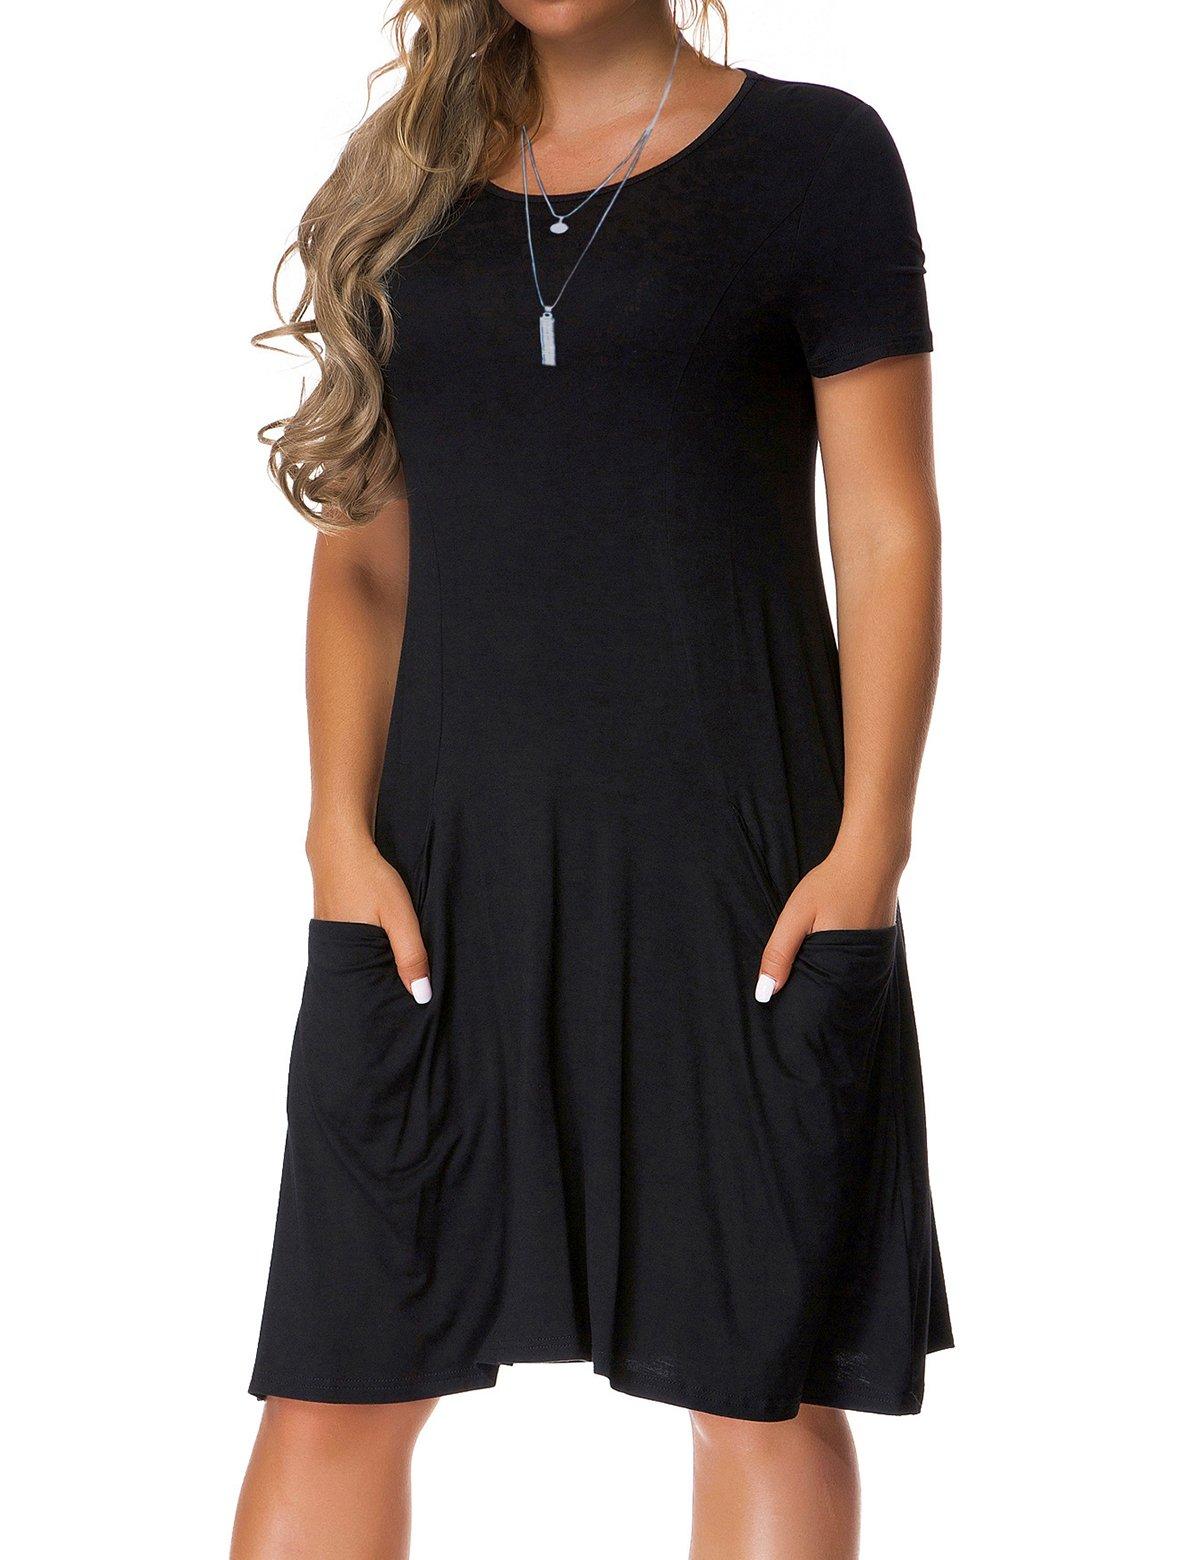 VERABENDI Women's Plus Size Short Sleeve Dress Casual Loose Pocket T-Shirt Dress Black L